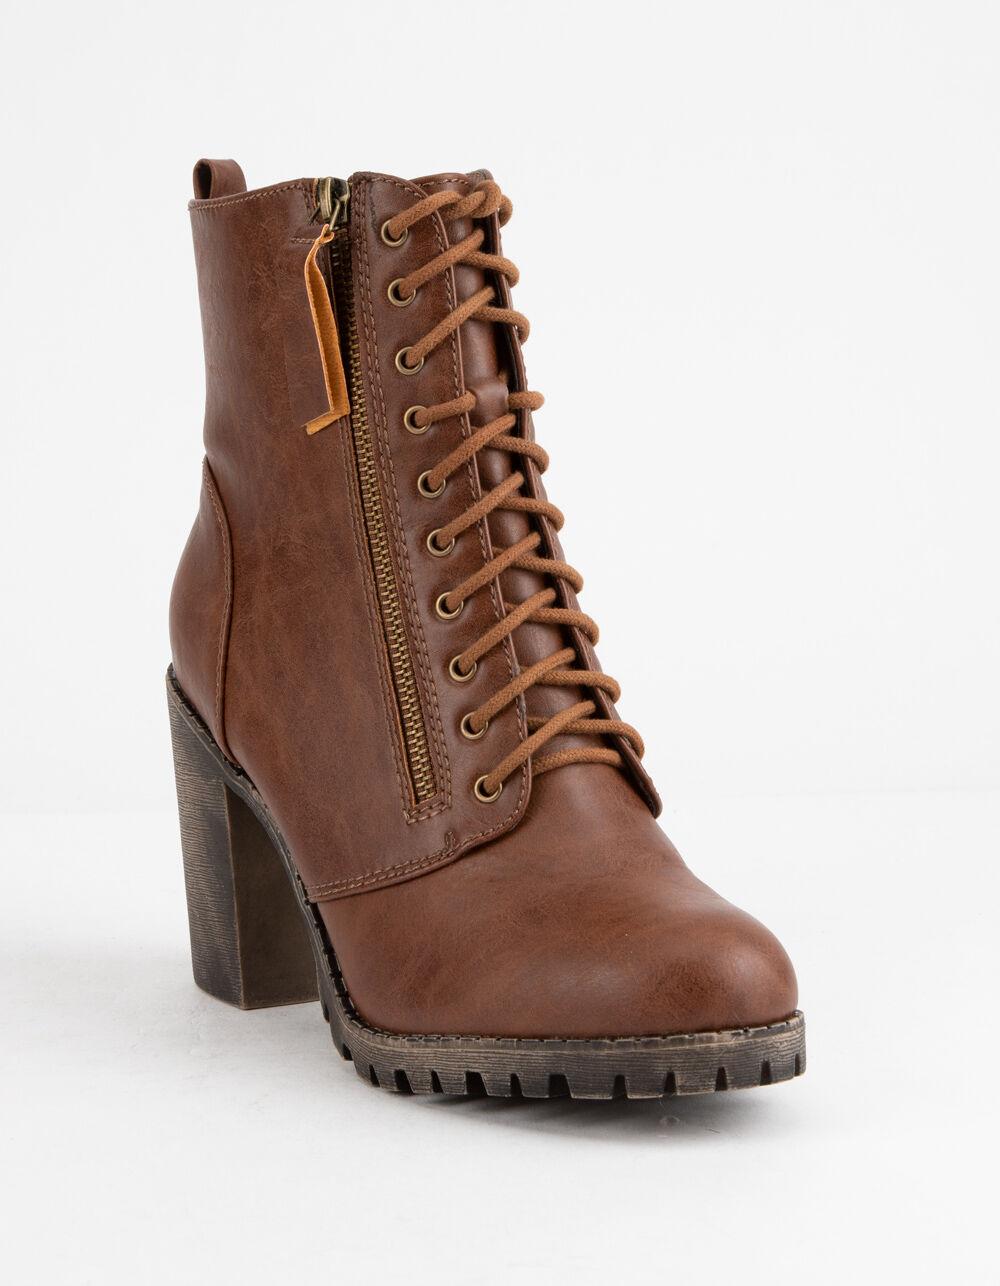 SODA Malia Tan Heeled Combat Boots